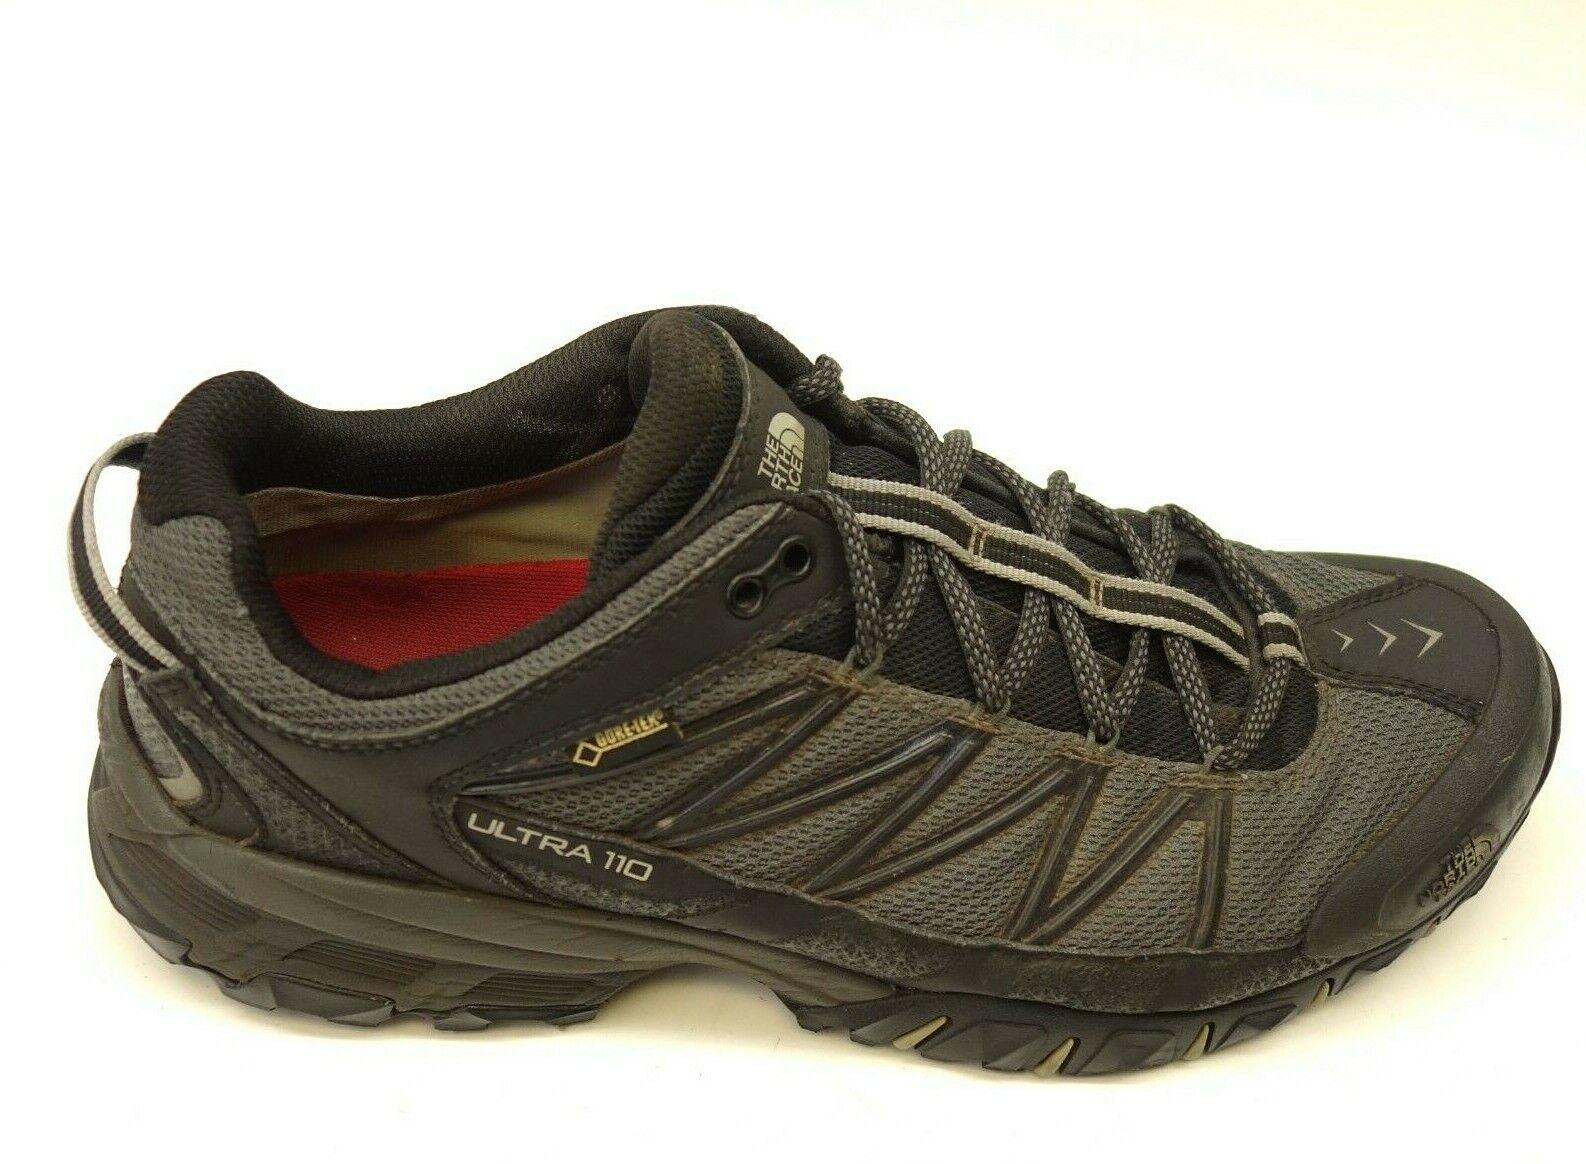 North Face Ultra 110 GTX Sz 10.5 Negro Atlético Soporte Trail Senderismo Zapatos para hombre